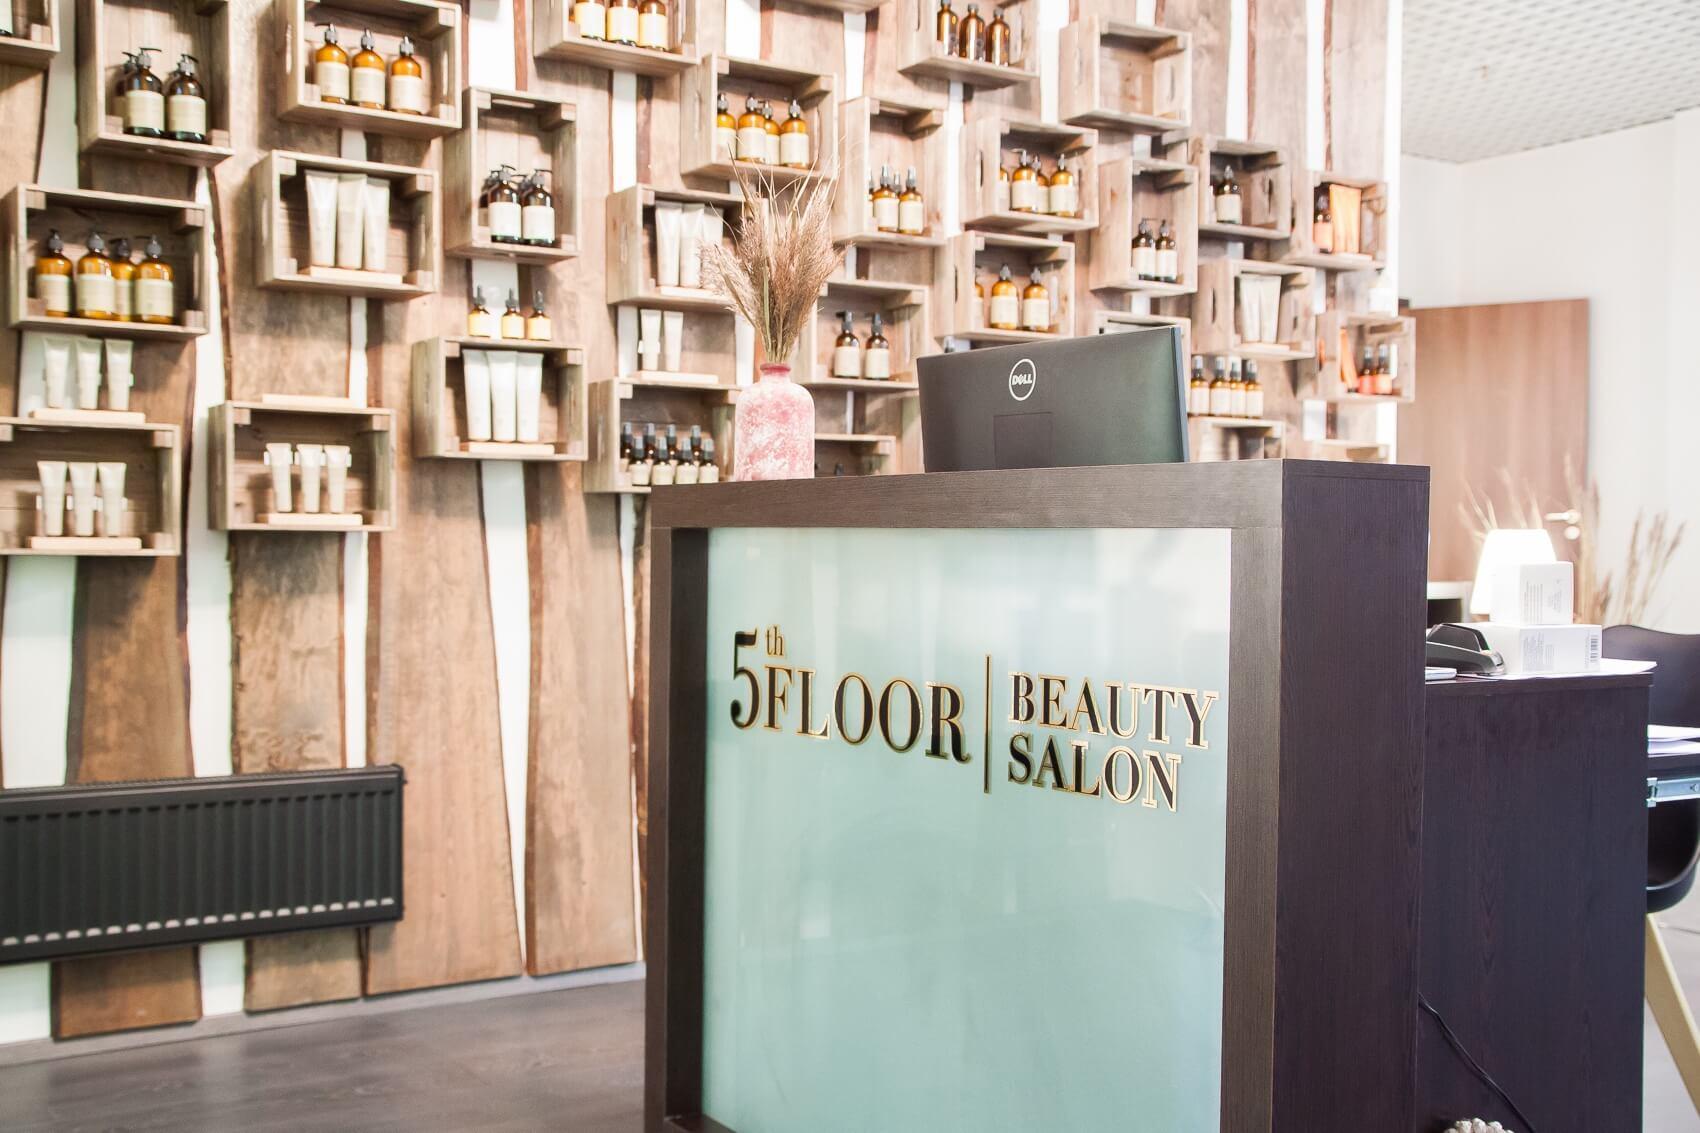 Beauty salon in tallinn 5th floor beauty salon for About us beauty salon